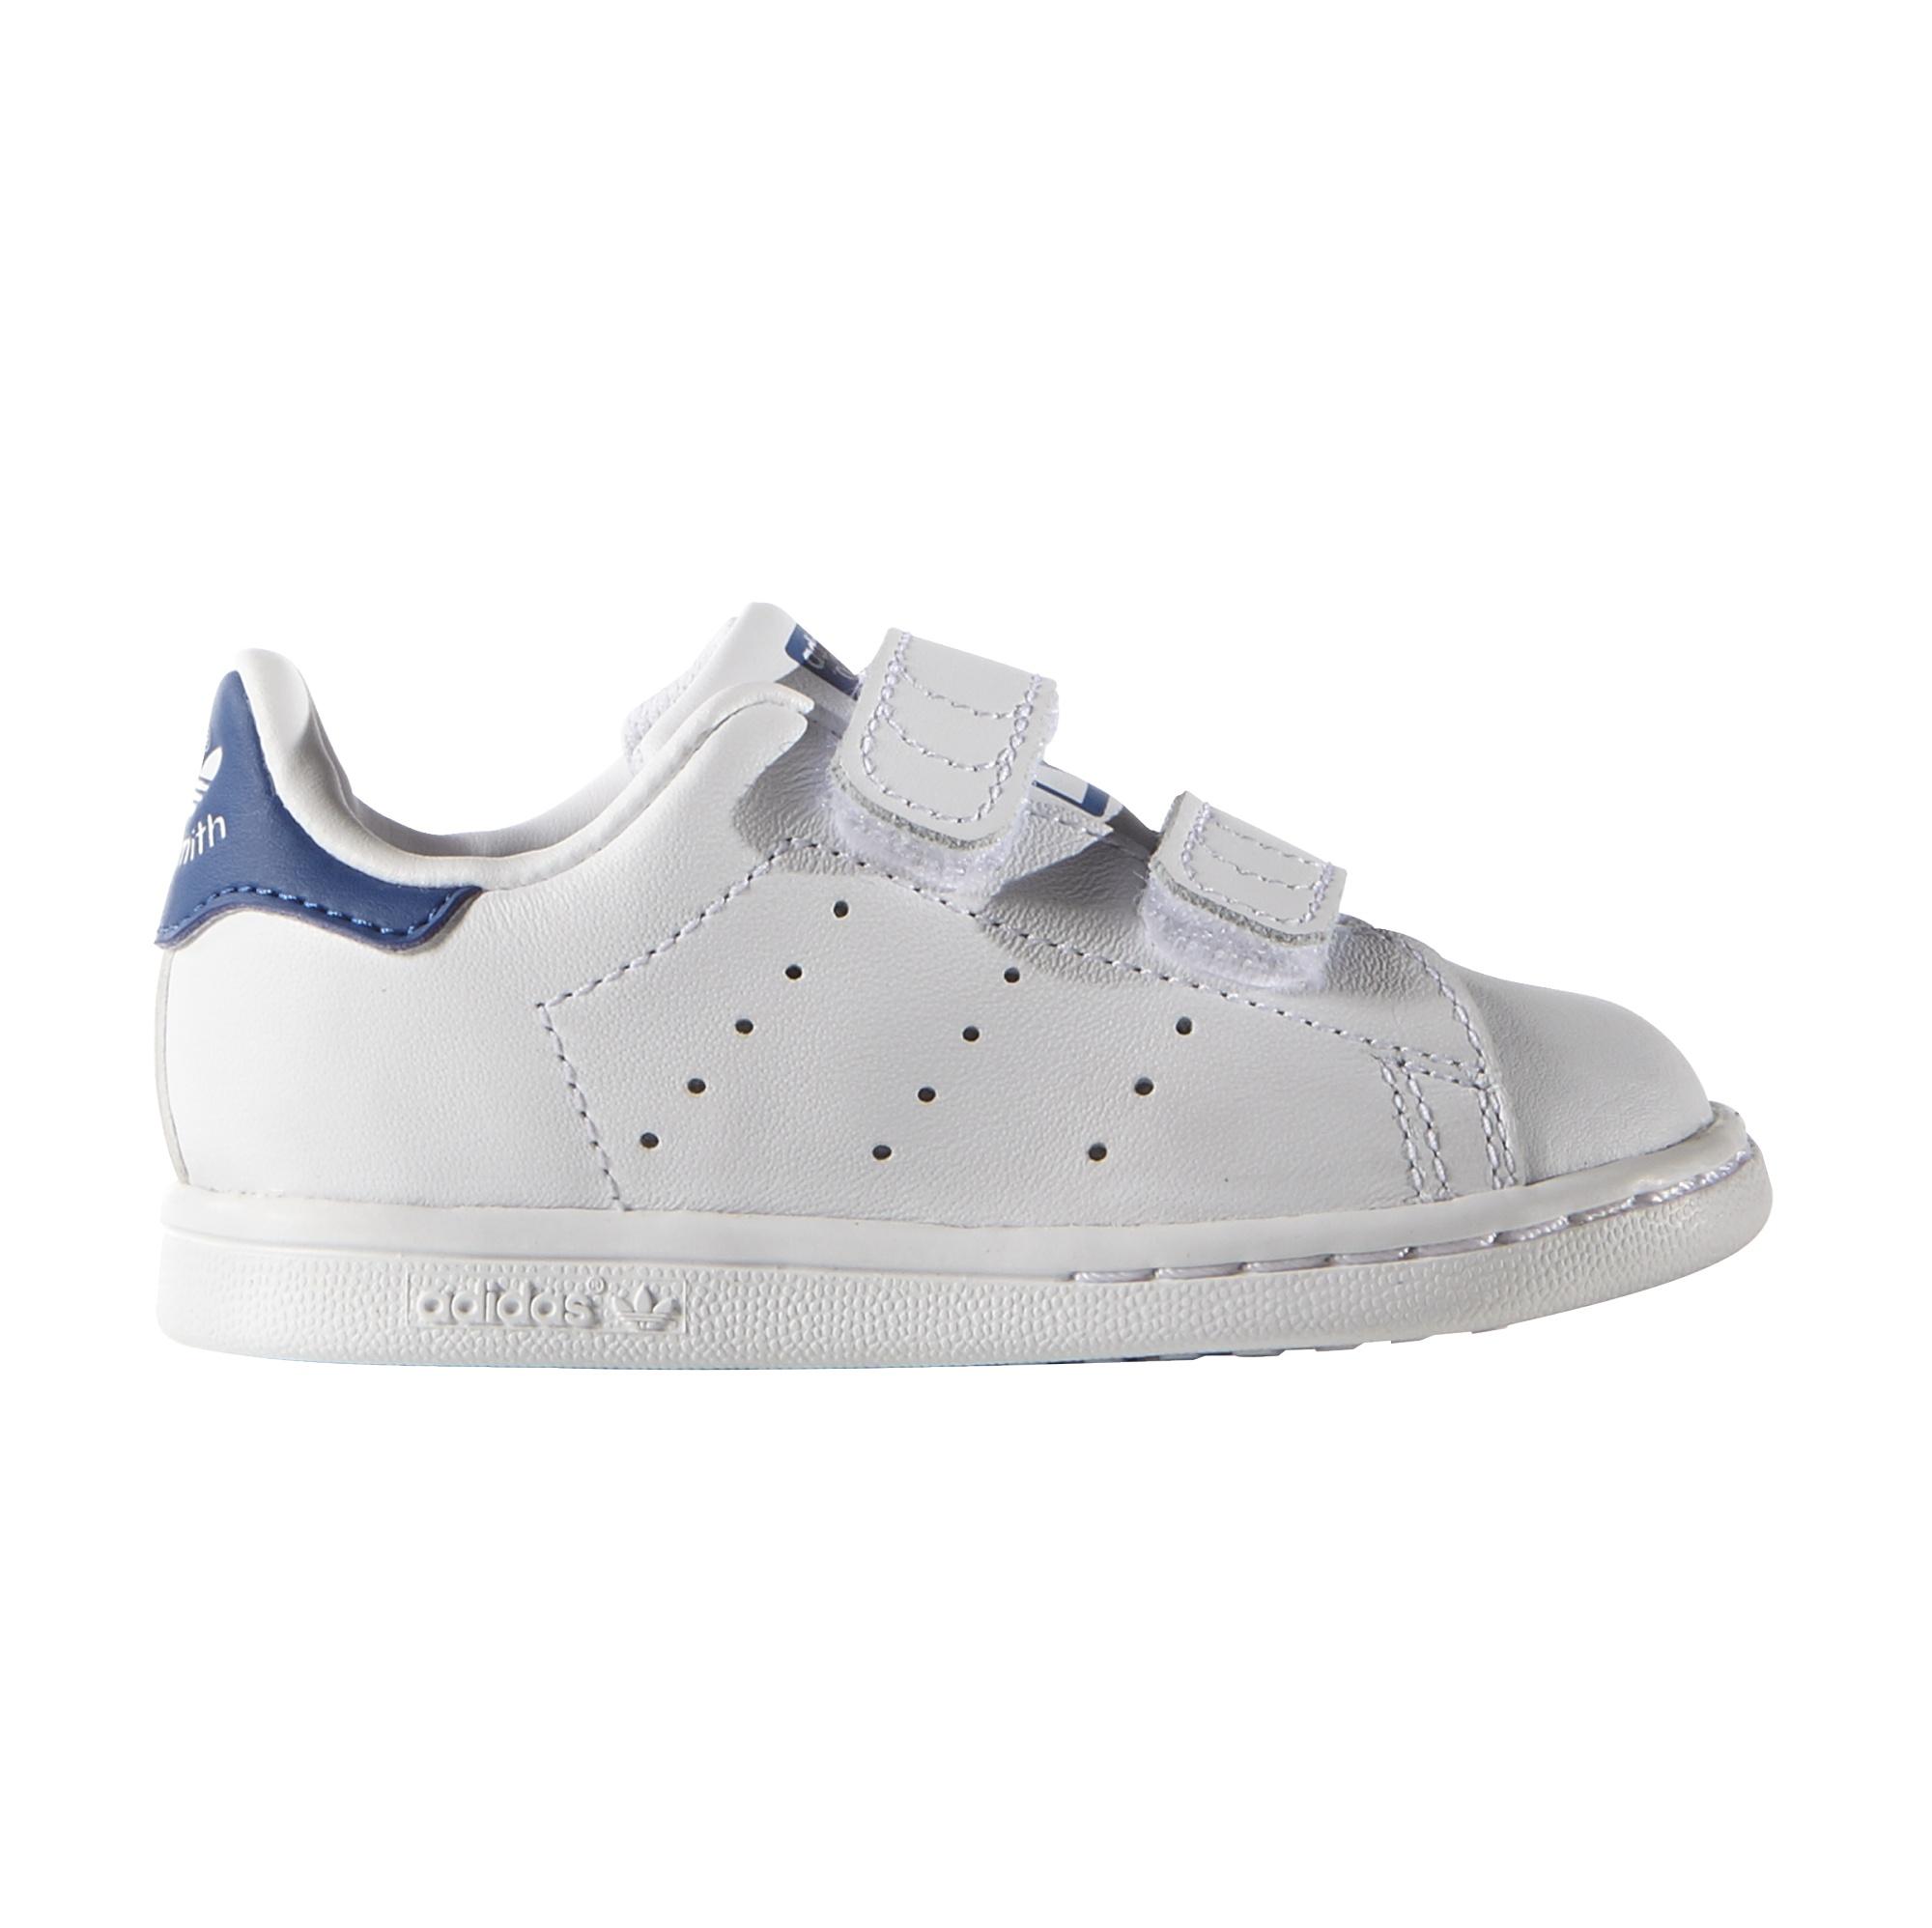 100% authentic ba3c2 d37ed Adidas Originals Stan Smith CF I (blanco azul)